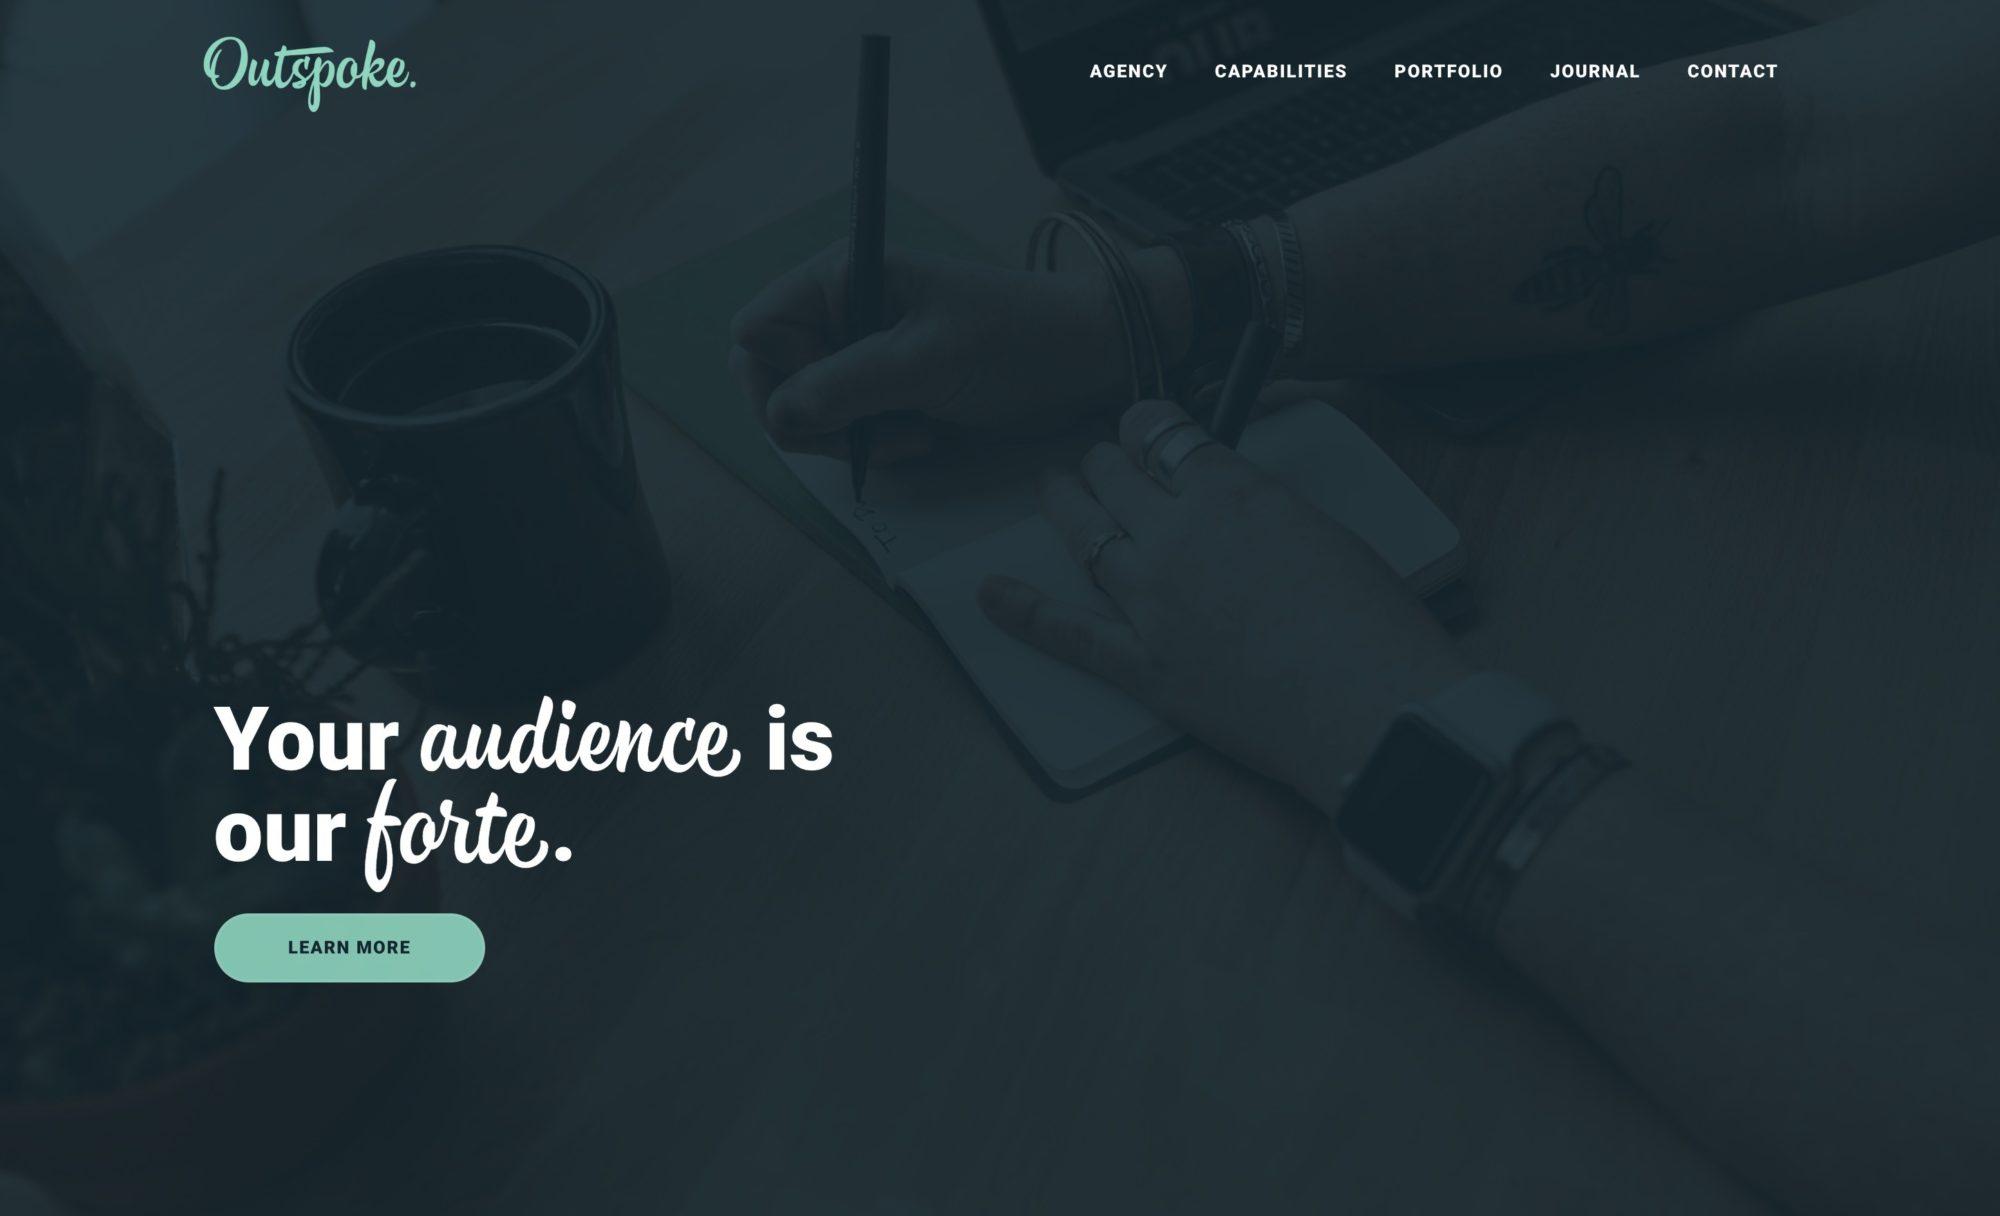 Outspoke Agency - Marketing website inspiration